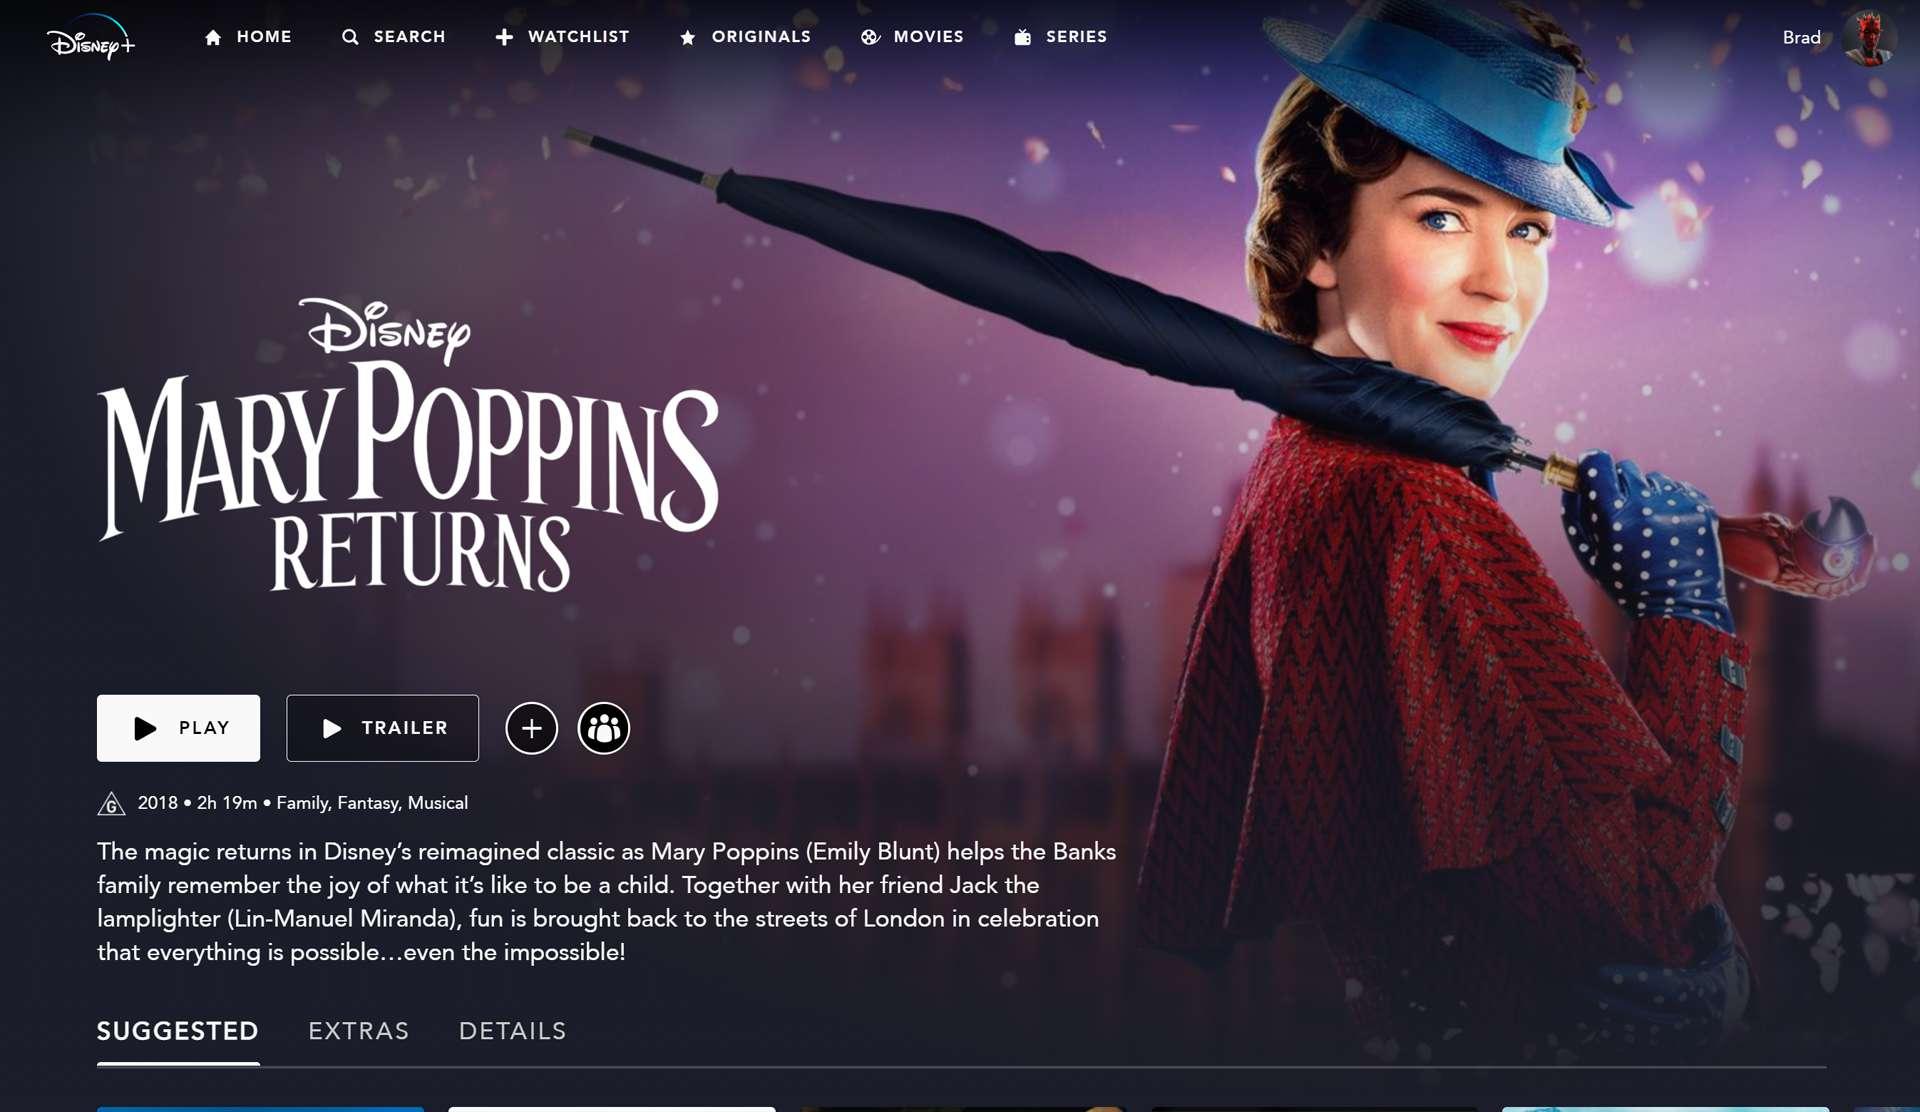 Disney kids movie Mary Poppins Returns on Disney Plus.